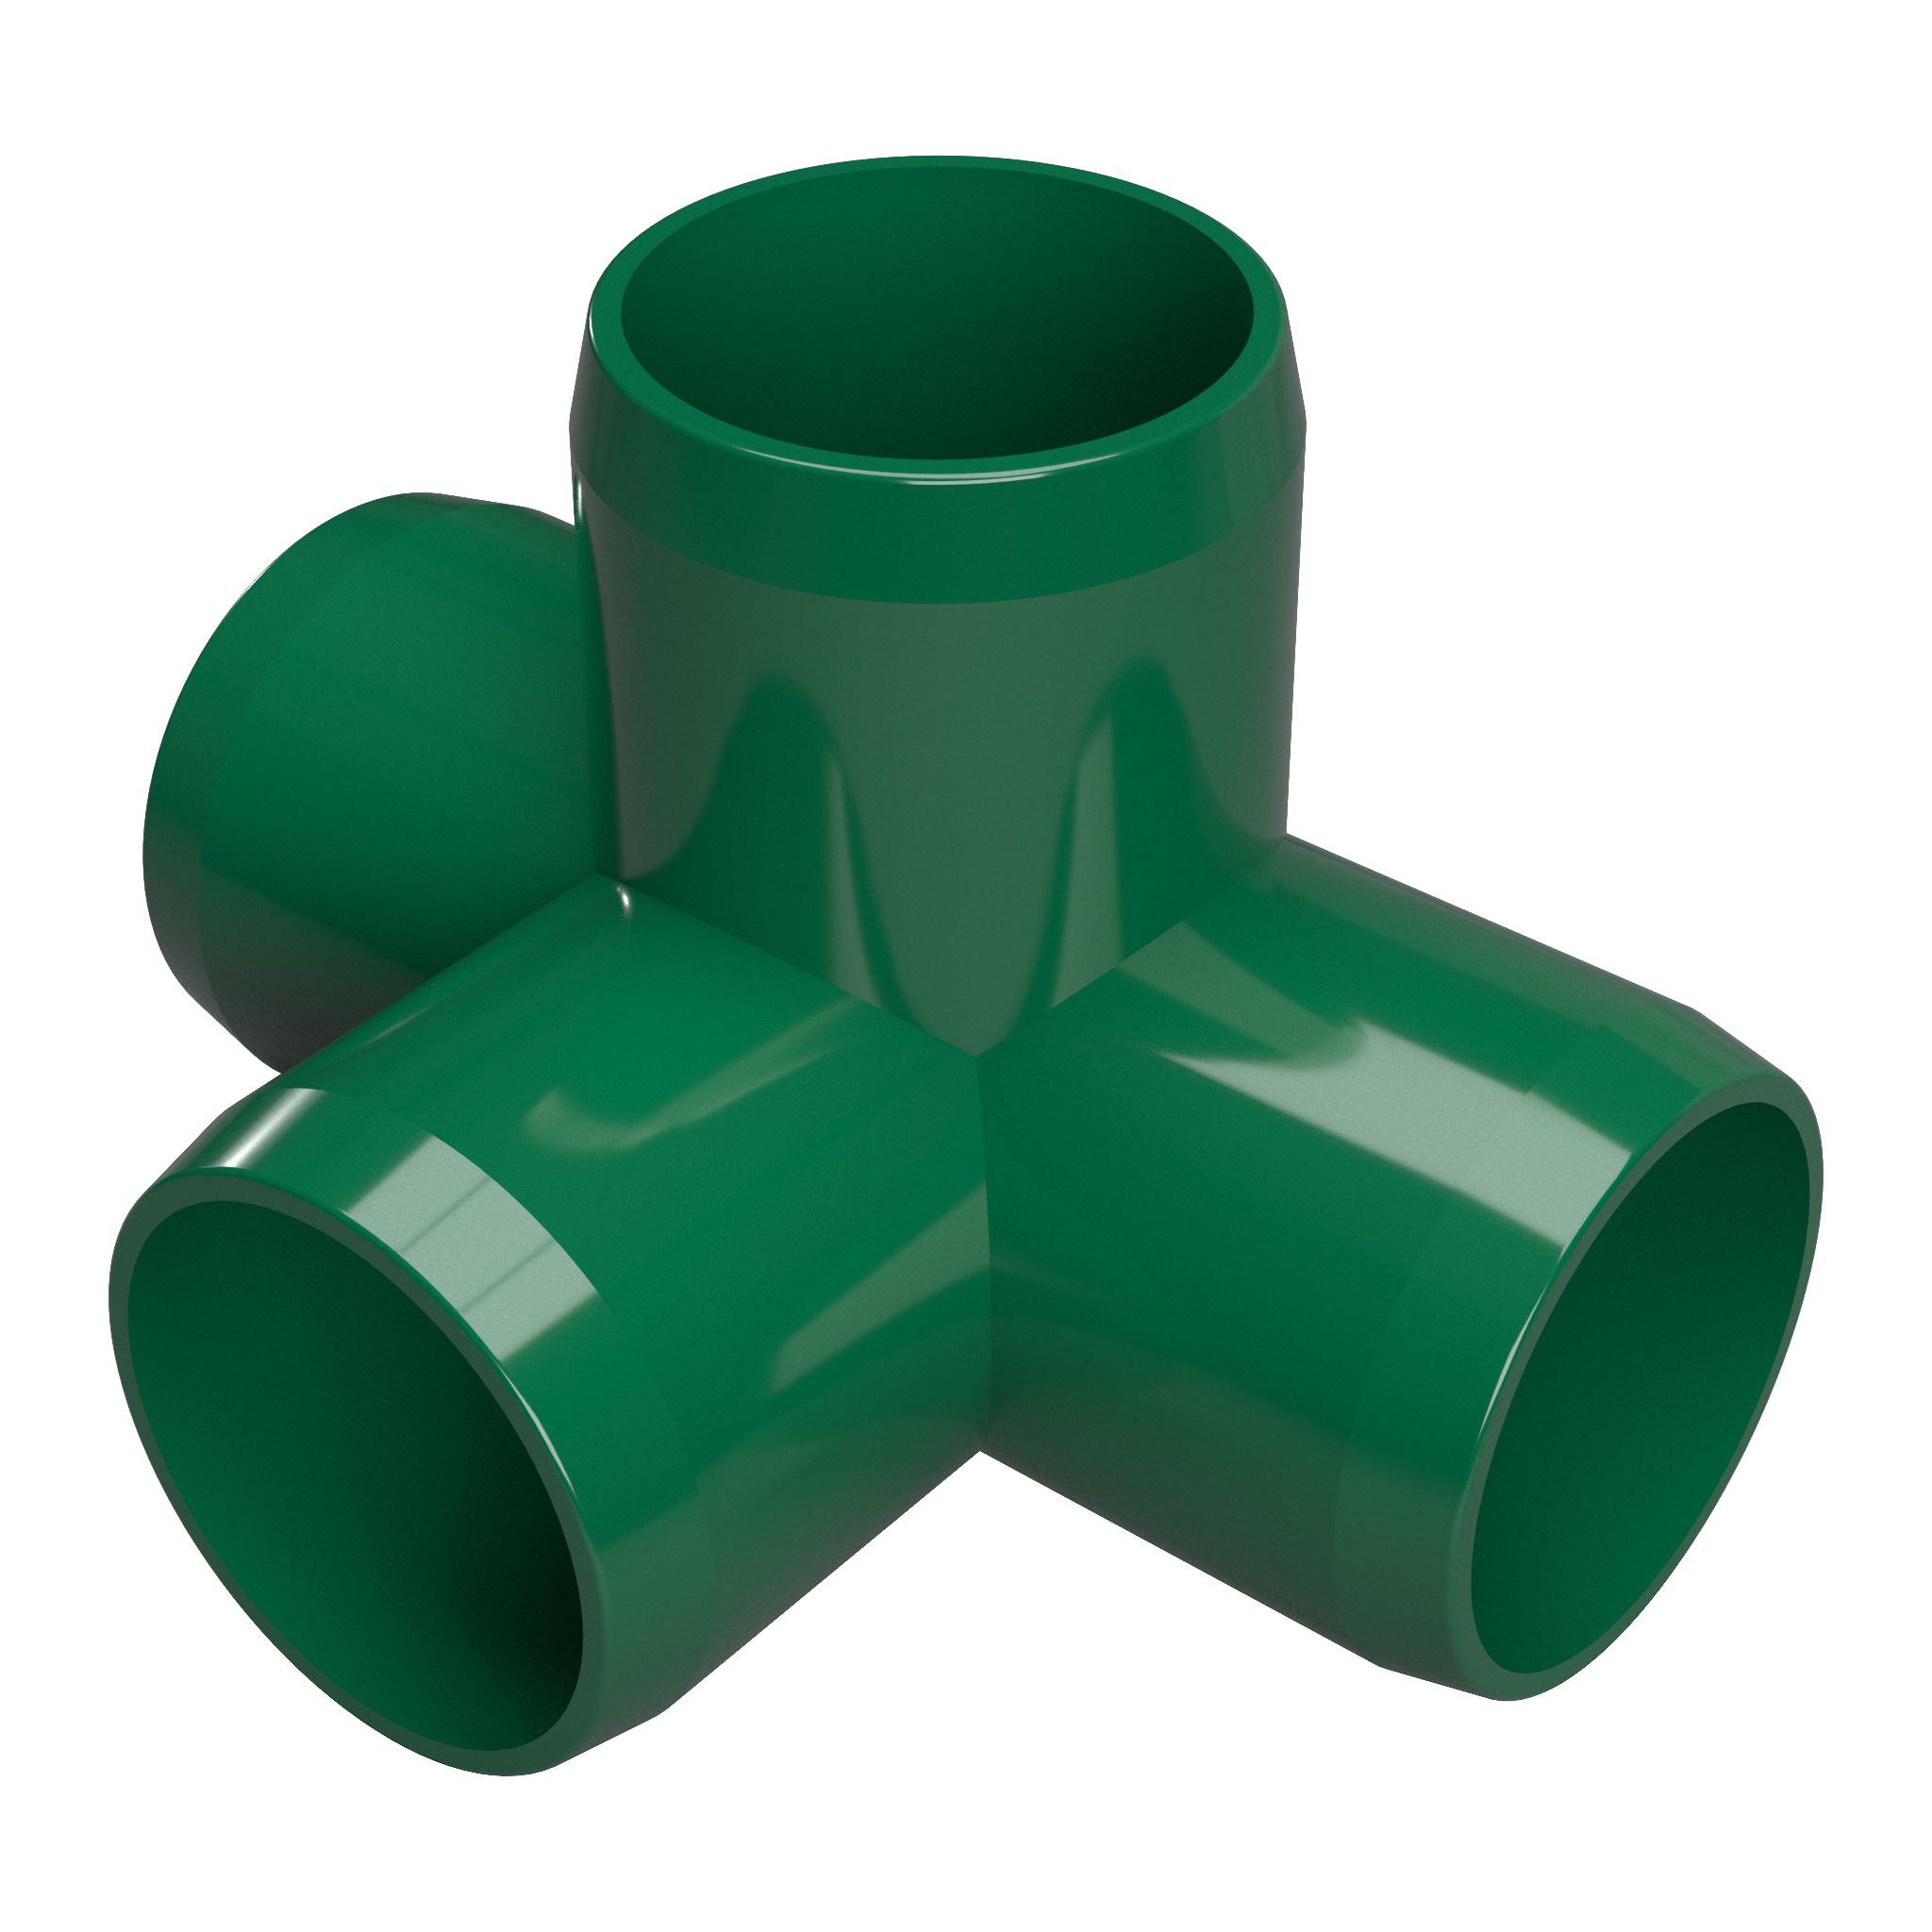 "FORMUFIT F1144WT-GR-4 4-Way Tee PVC Fitting, Furniture Grade, 1-1/4"" Size, Green , 4-Pack"